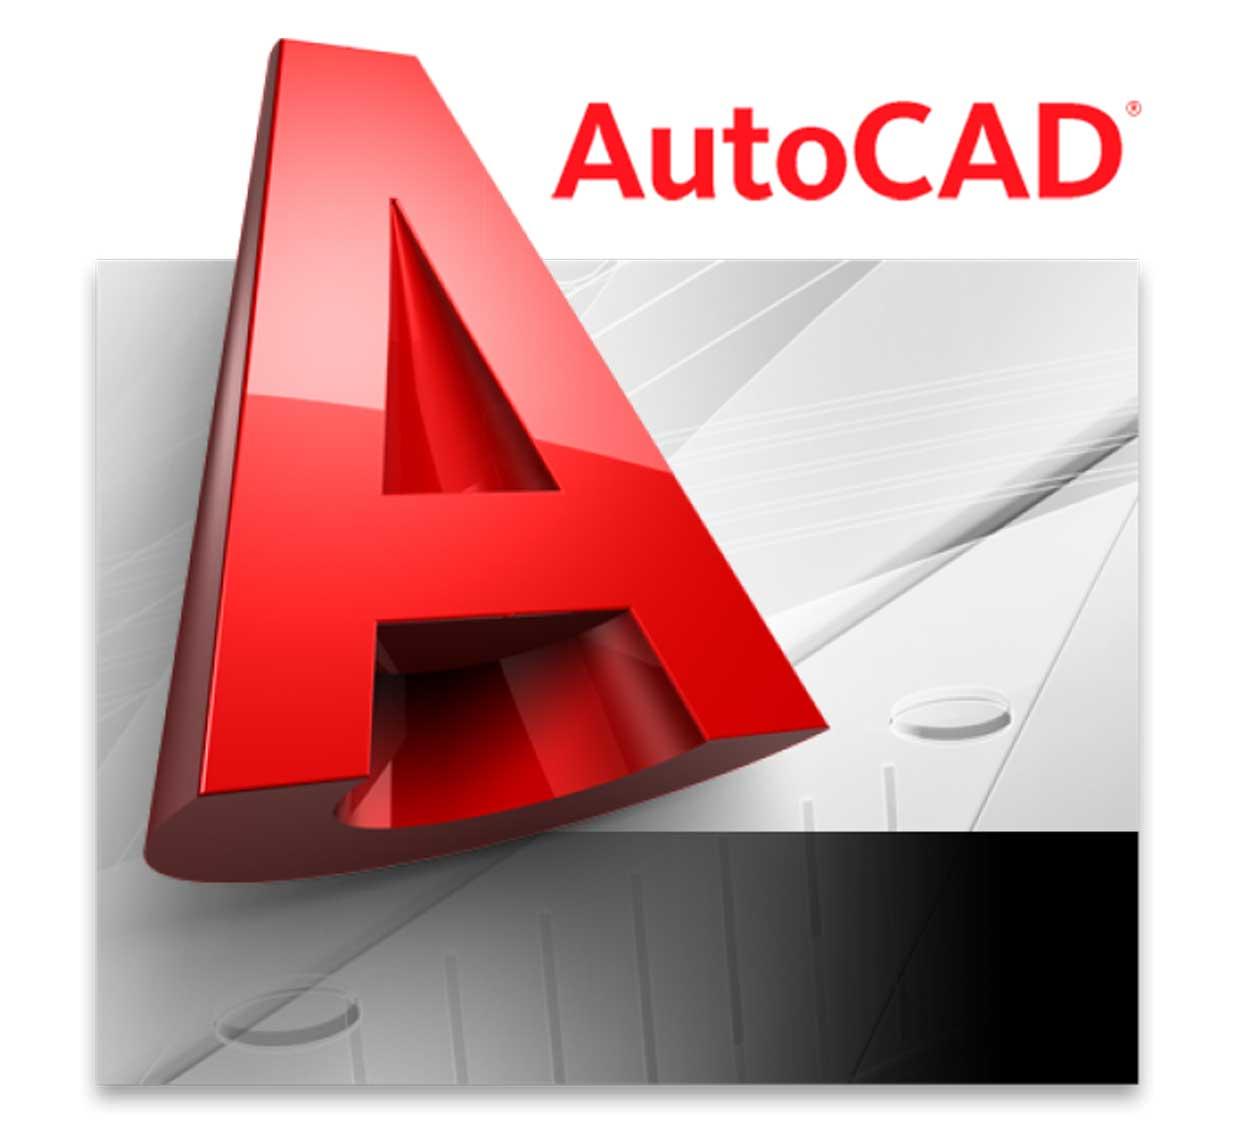 1483620337-autocad-logo.jpg